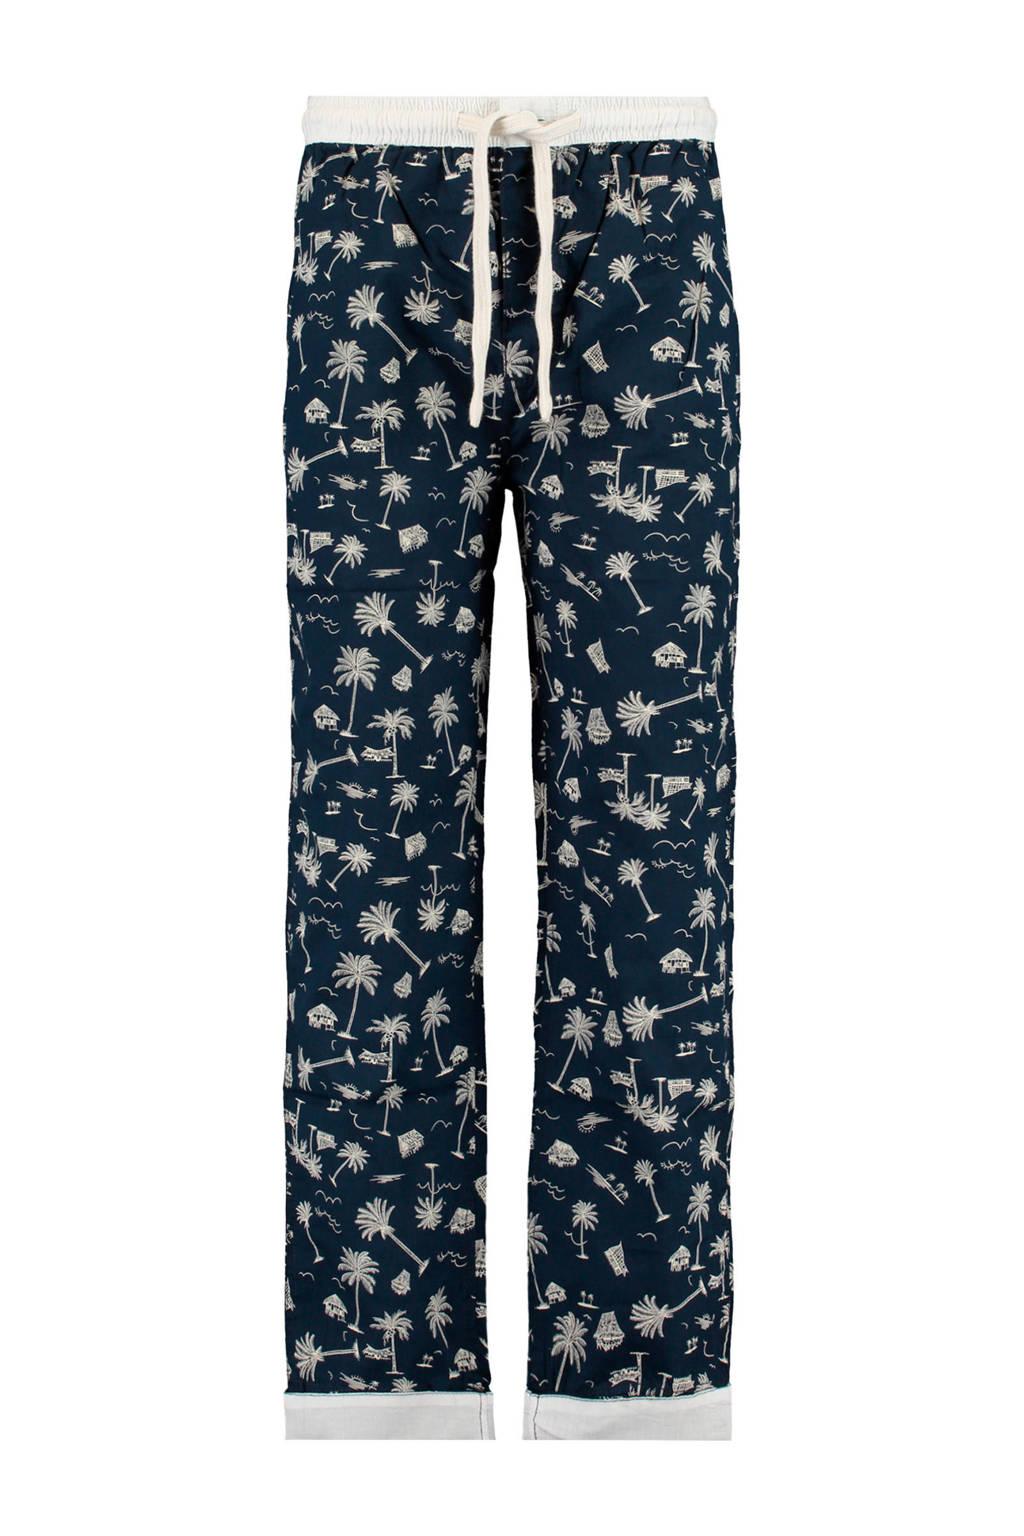 America Today Junior pyjamabroek donkerblauw/wit, Donkerblauw/wit